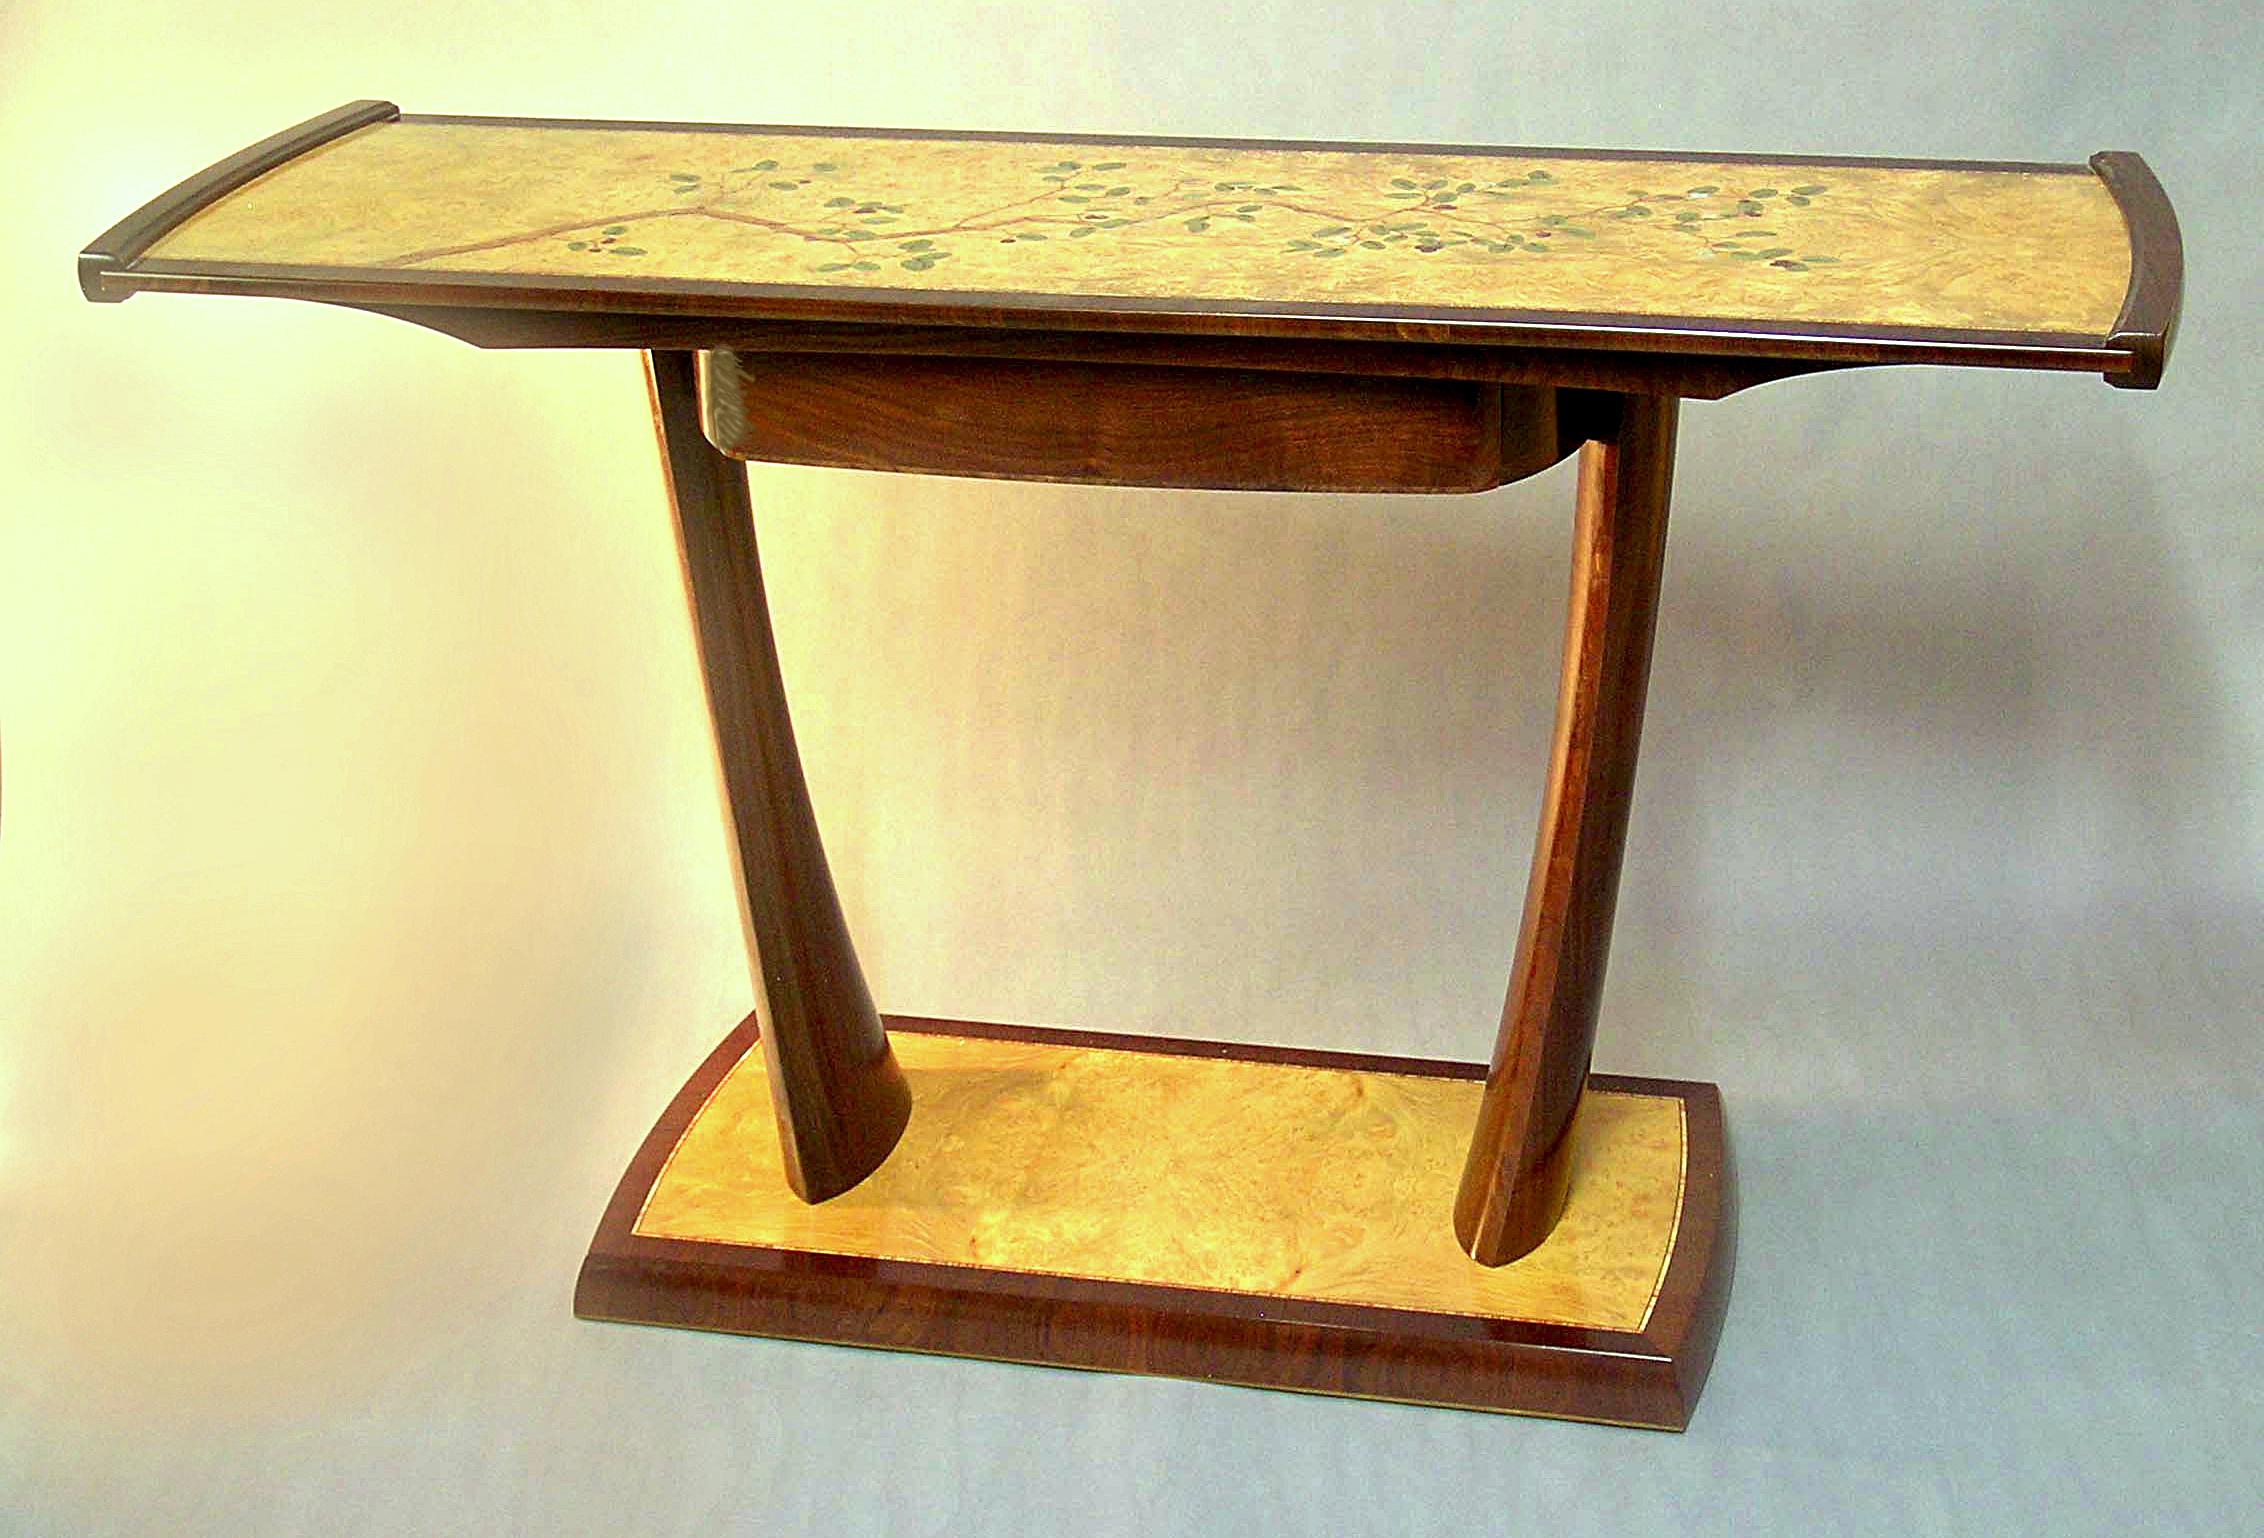 20. Manzanita Table - Paul Schürch - Veneer Artist